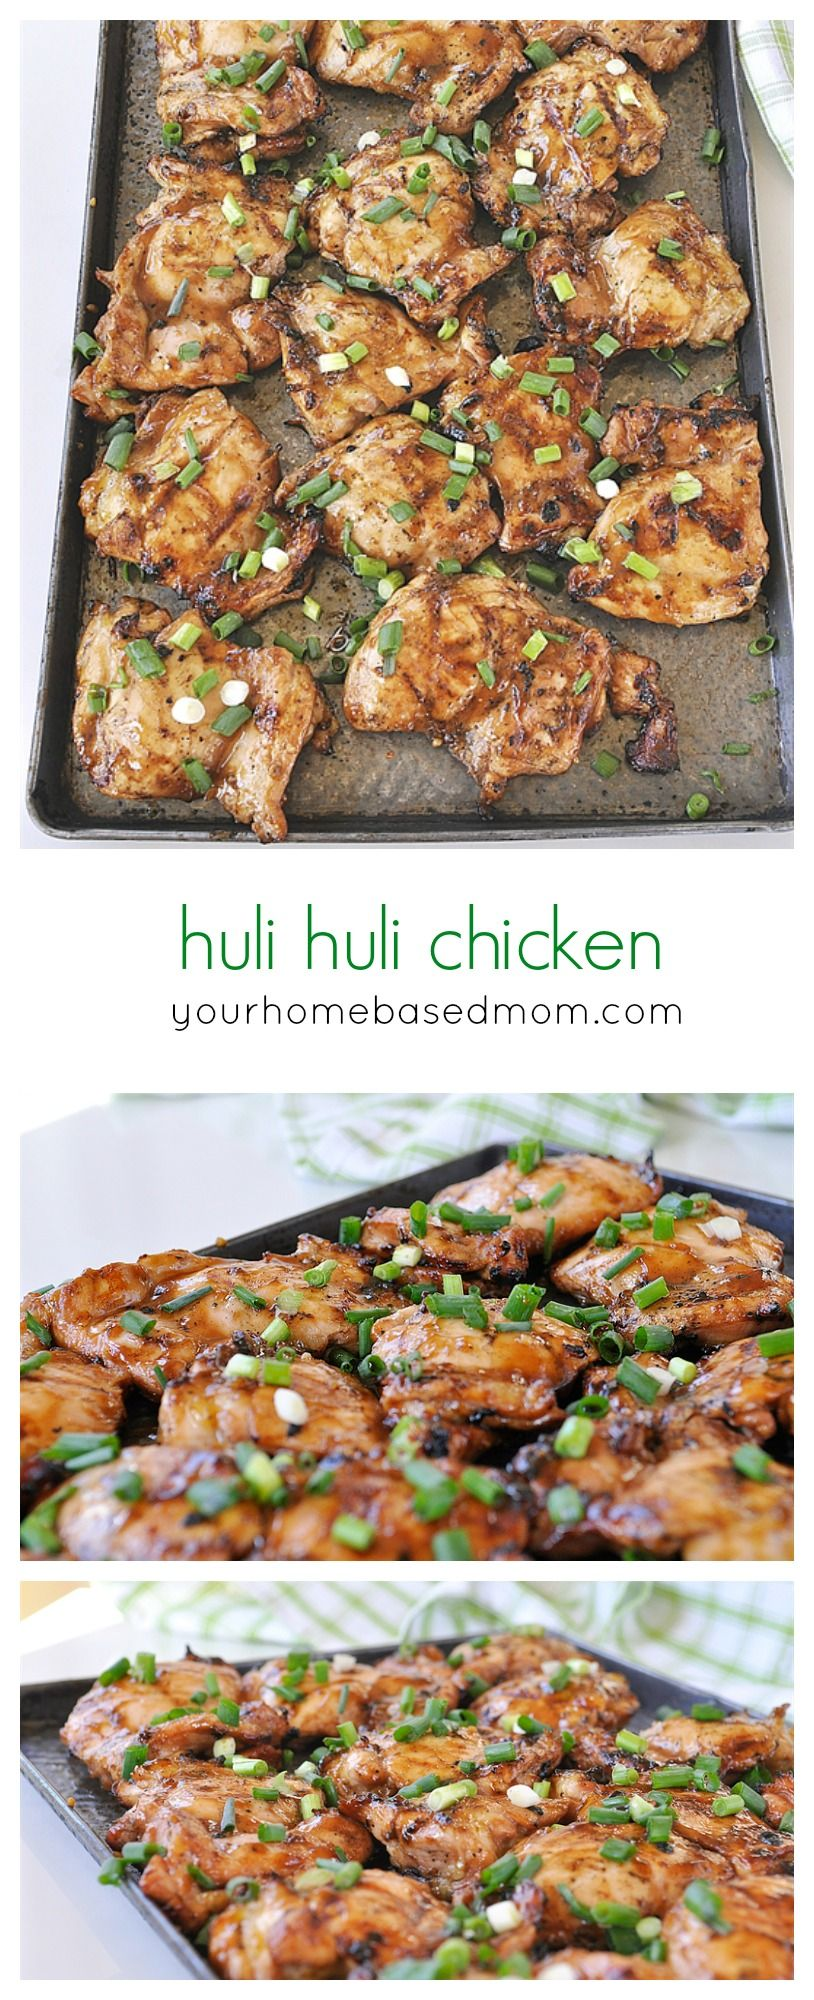 Huli Huli Chicken #hawaiianfoodrecipes